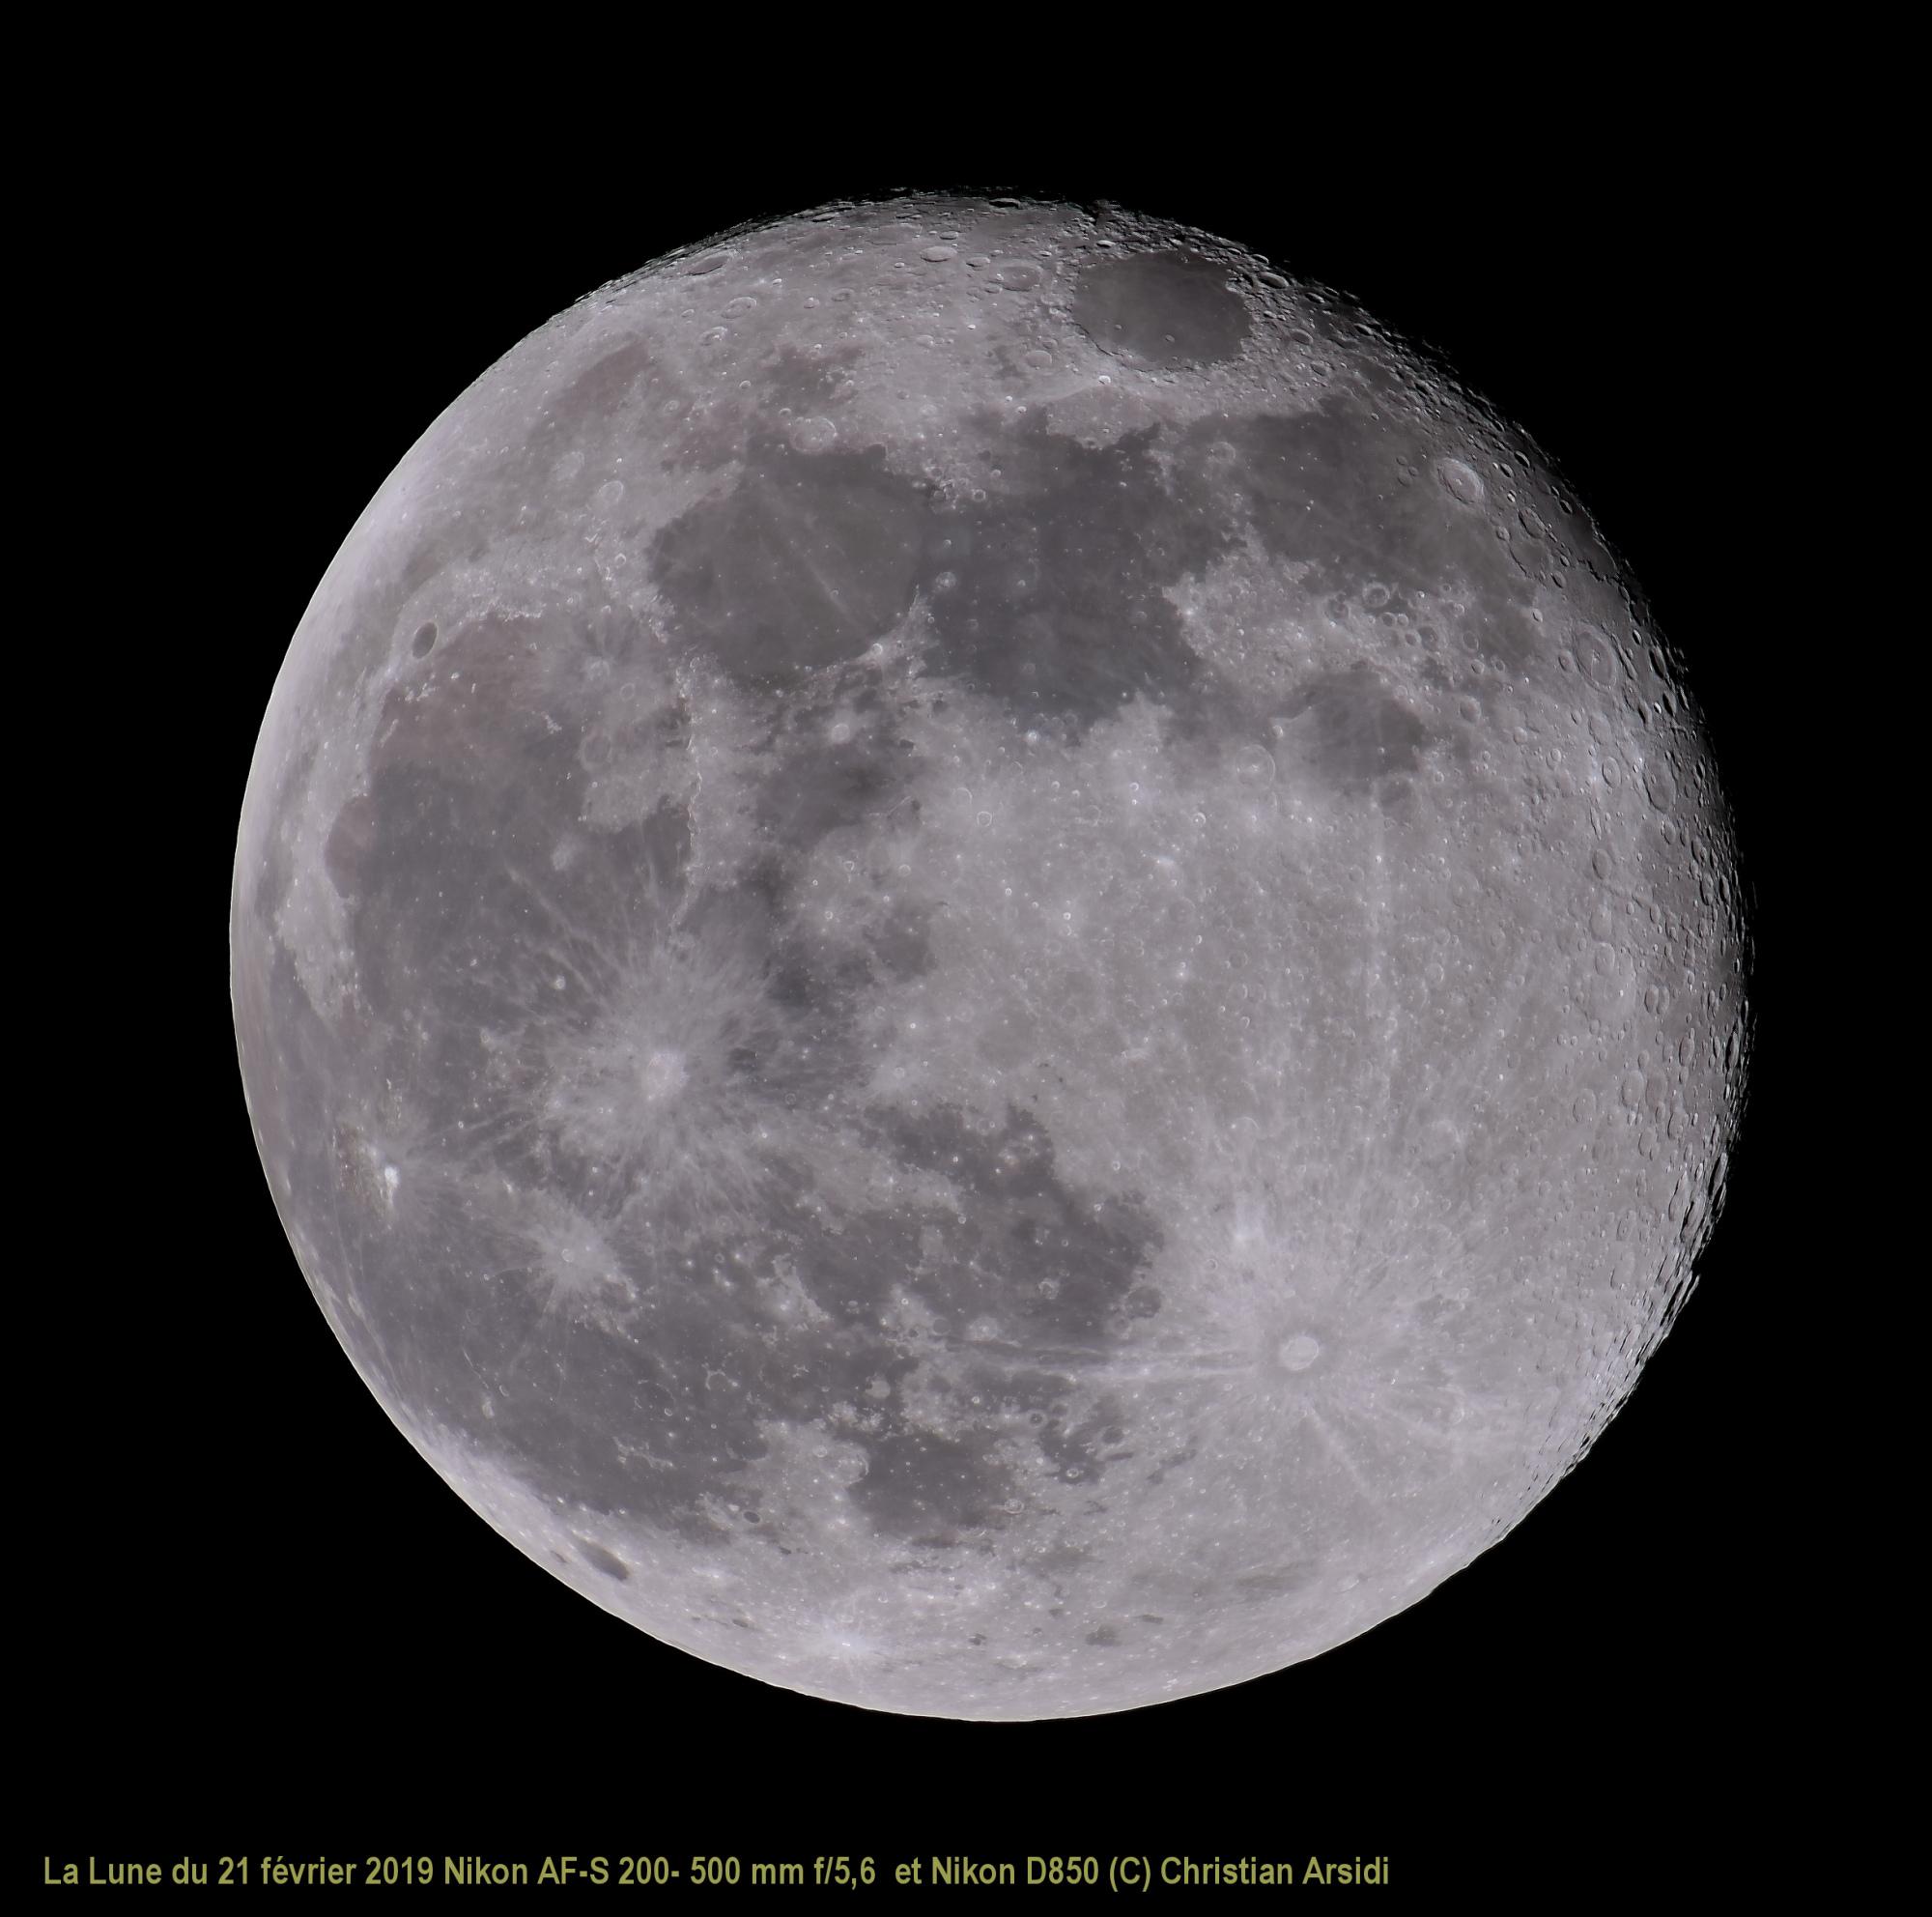 La Lune 25 images Vancittert TTB 90% JPEG.jpg